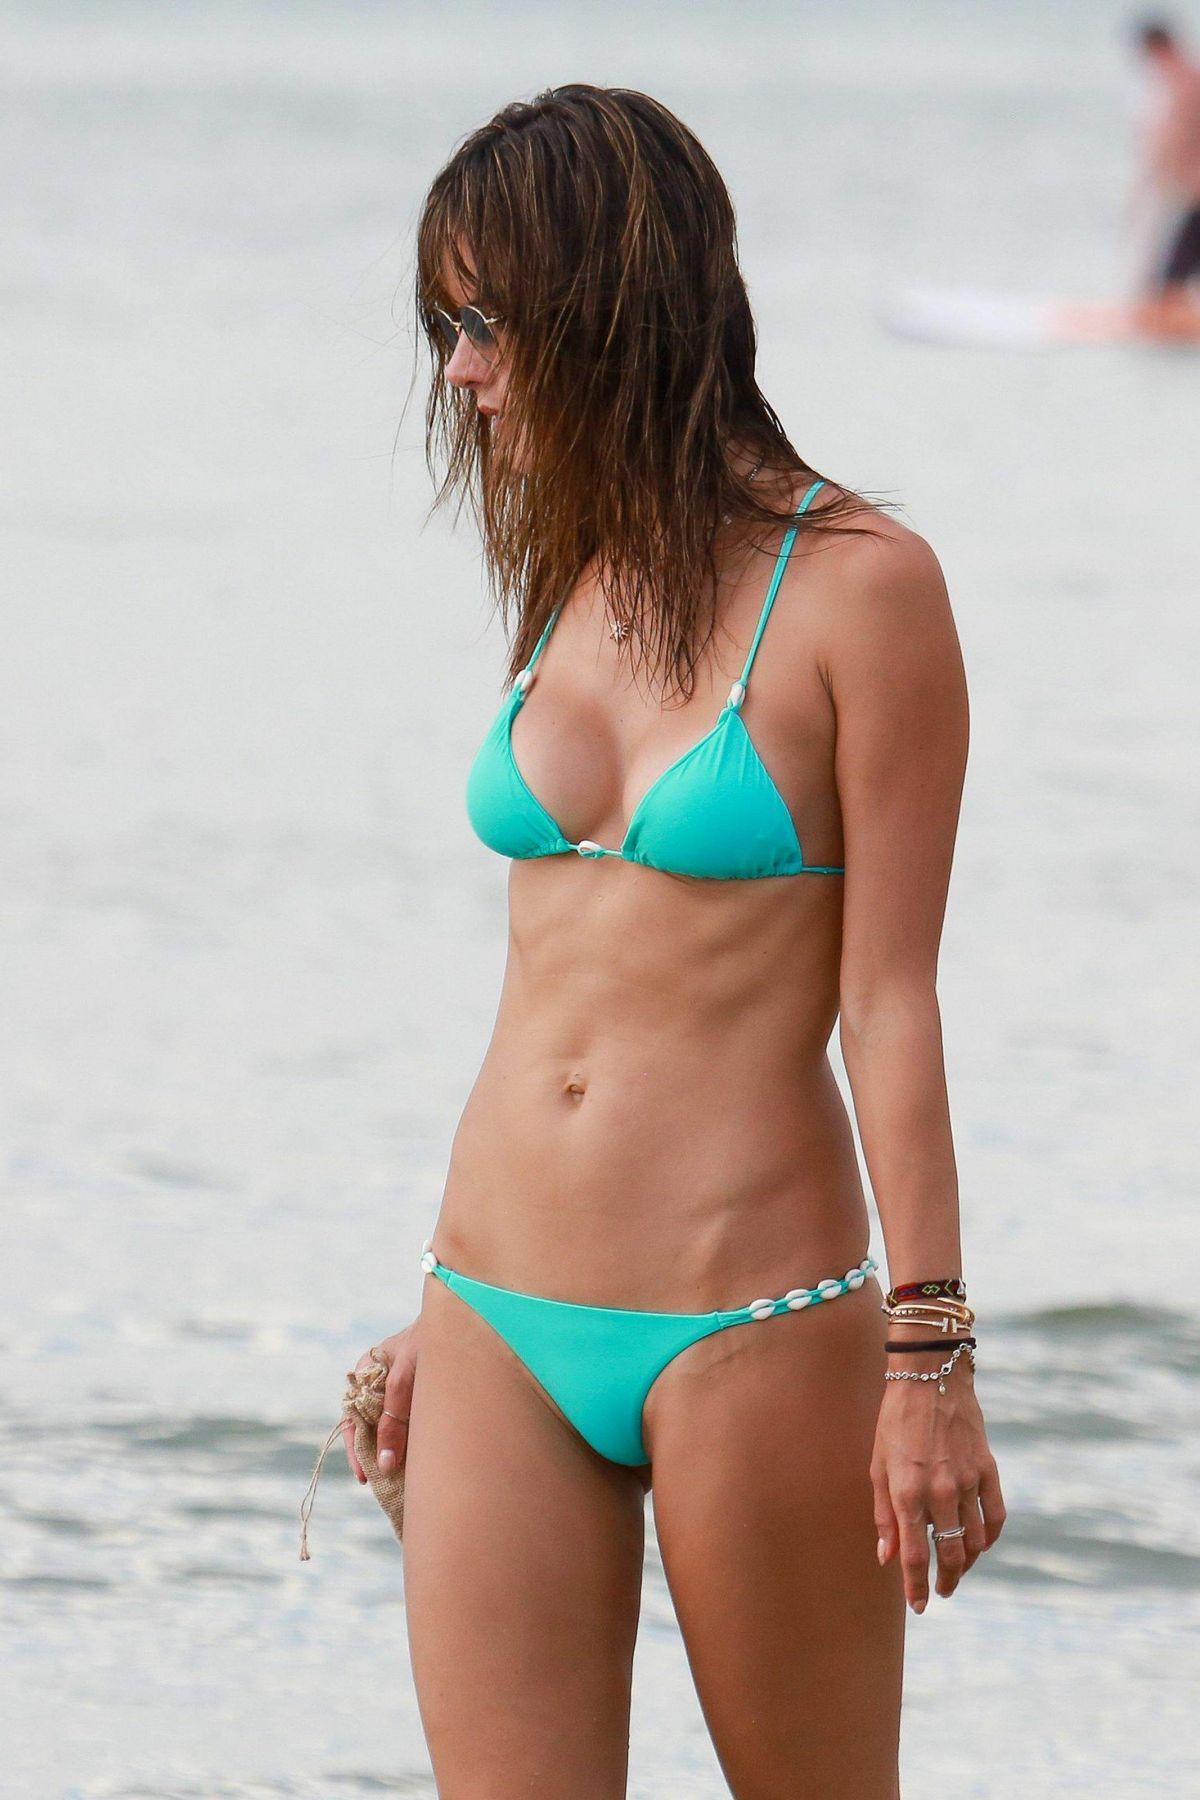 ALESSANDRA AMBROSIO in Bikini on the Beach in Canasvieiras 01/08/2017